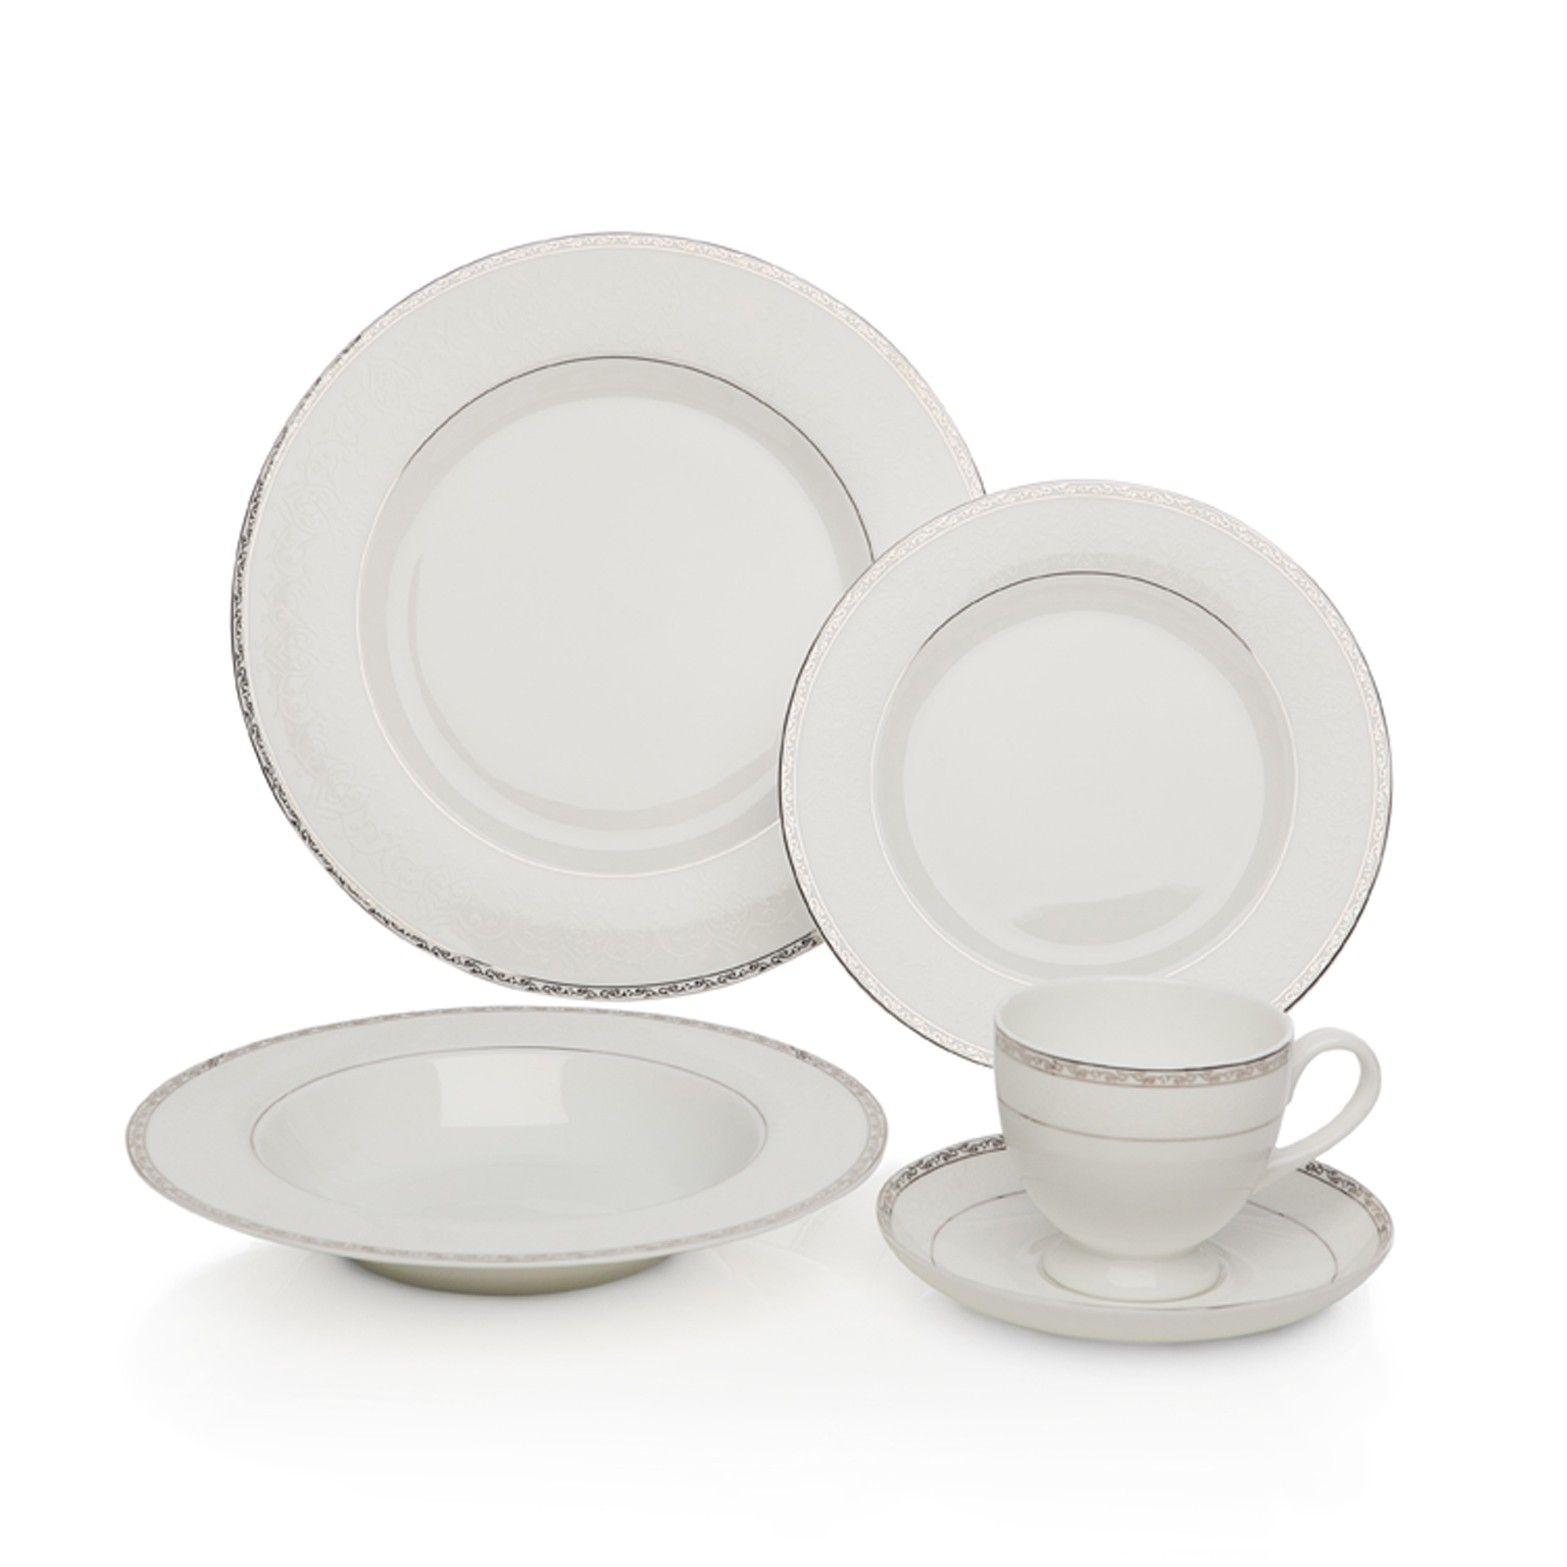 Platinum Bone China Dinner Set - Made from fine bone china this dinner set is both sophisticated and graceful.  sc 1 st  Pinterest & 20pc Platinum Bone China Dinner Set | Home Decor | Pinterest ...